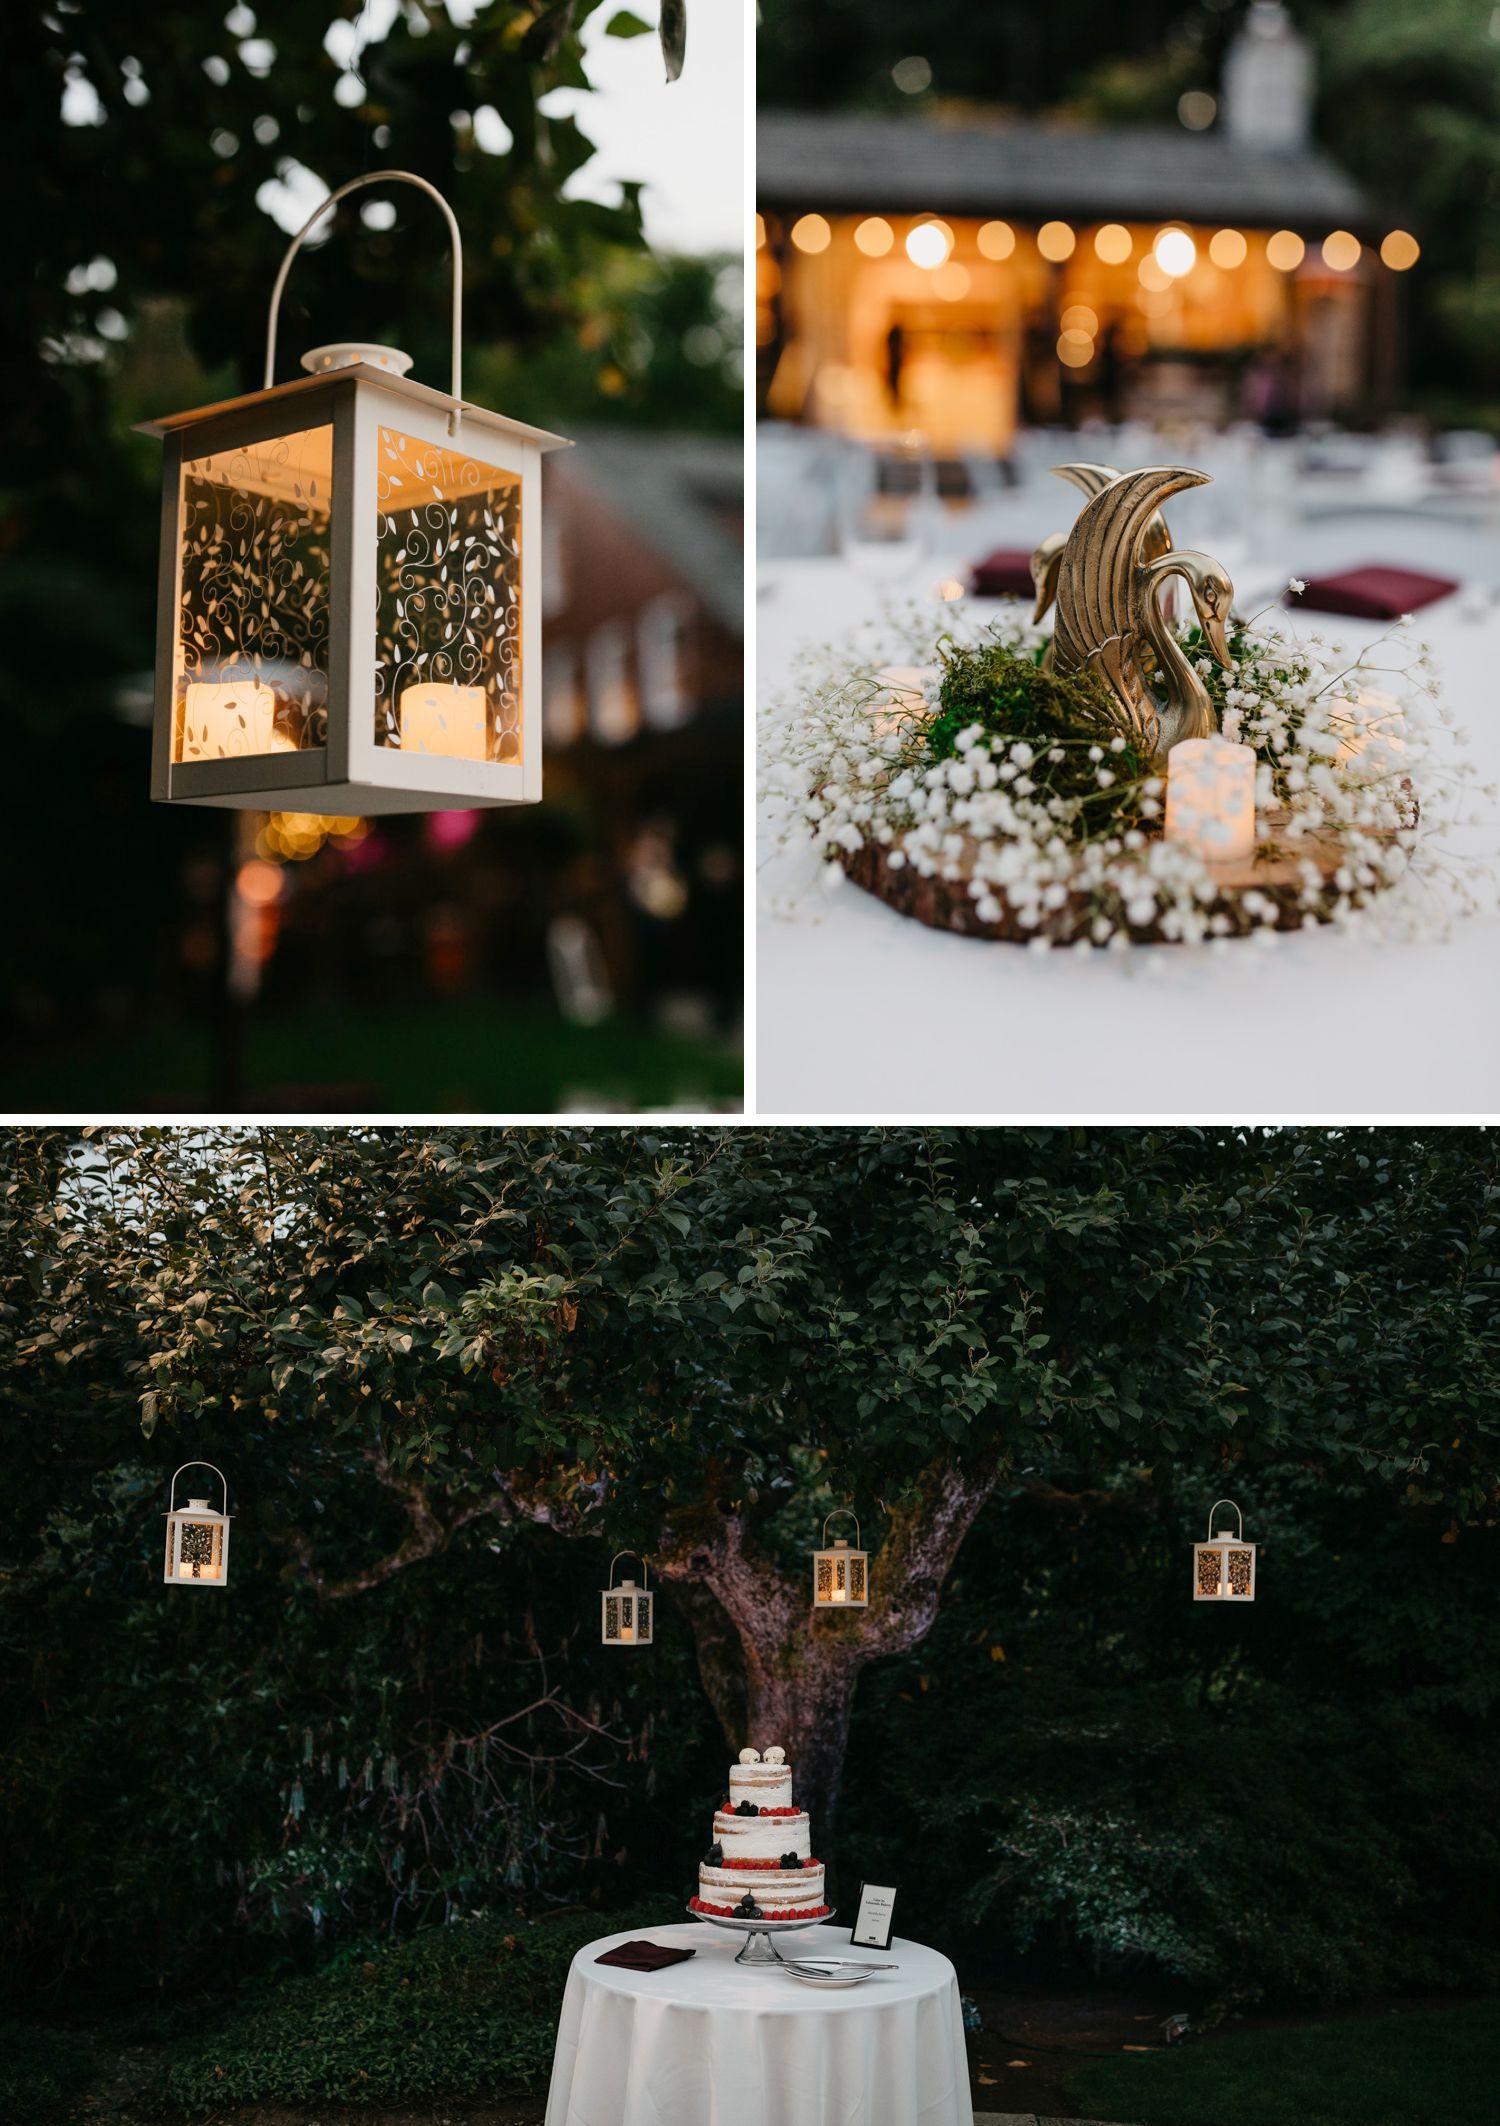 robinswood house wedding reception at night